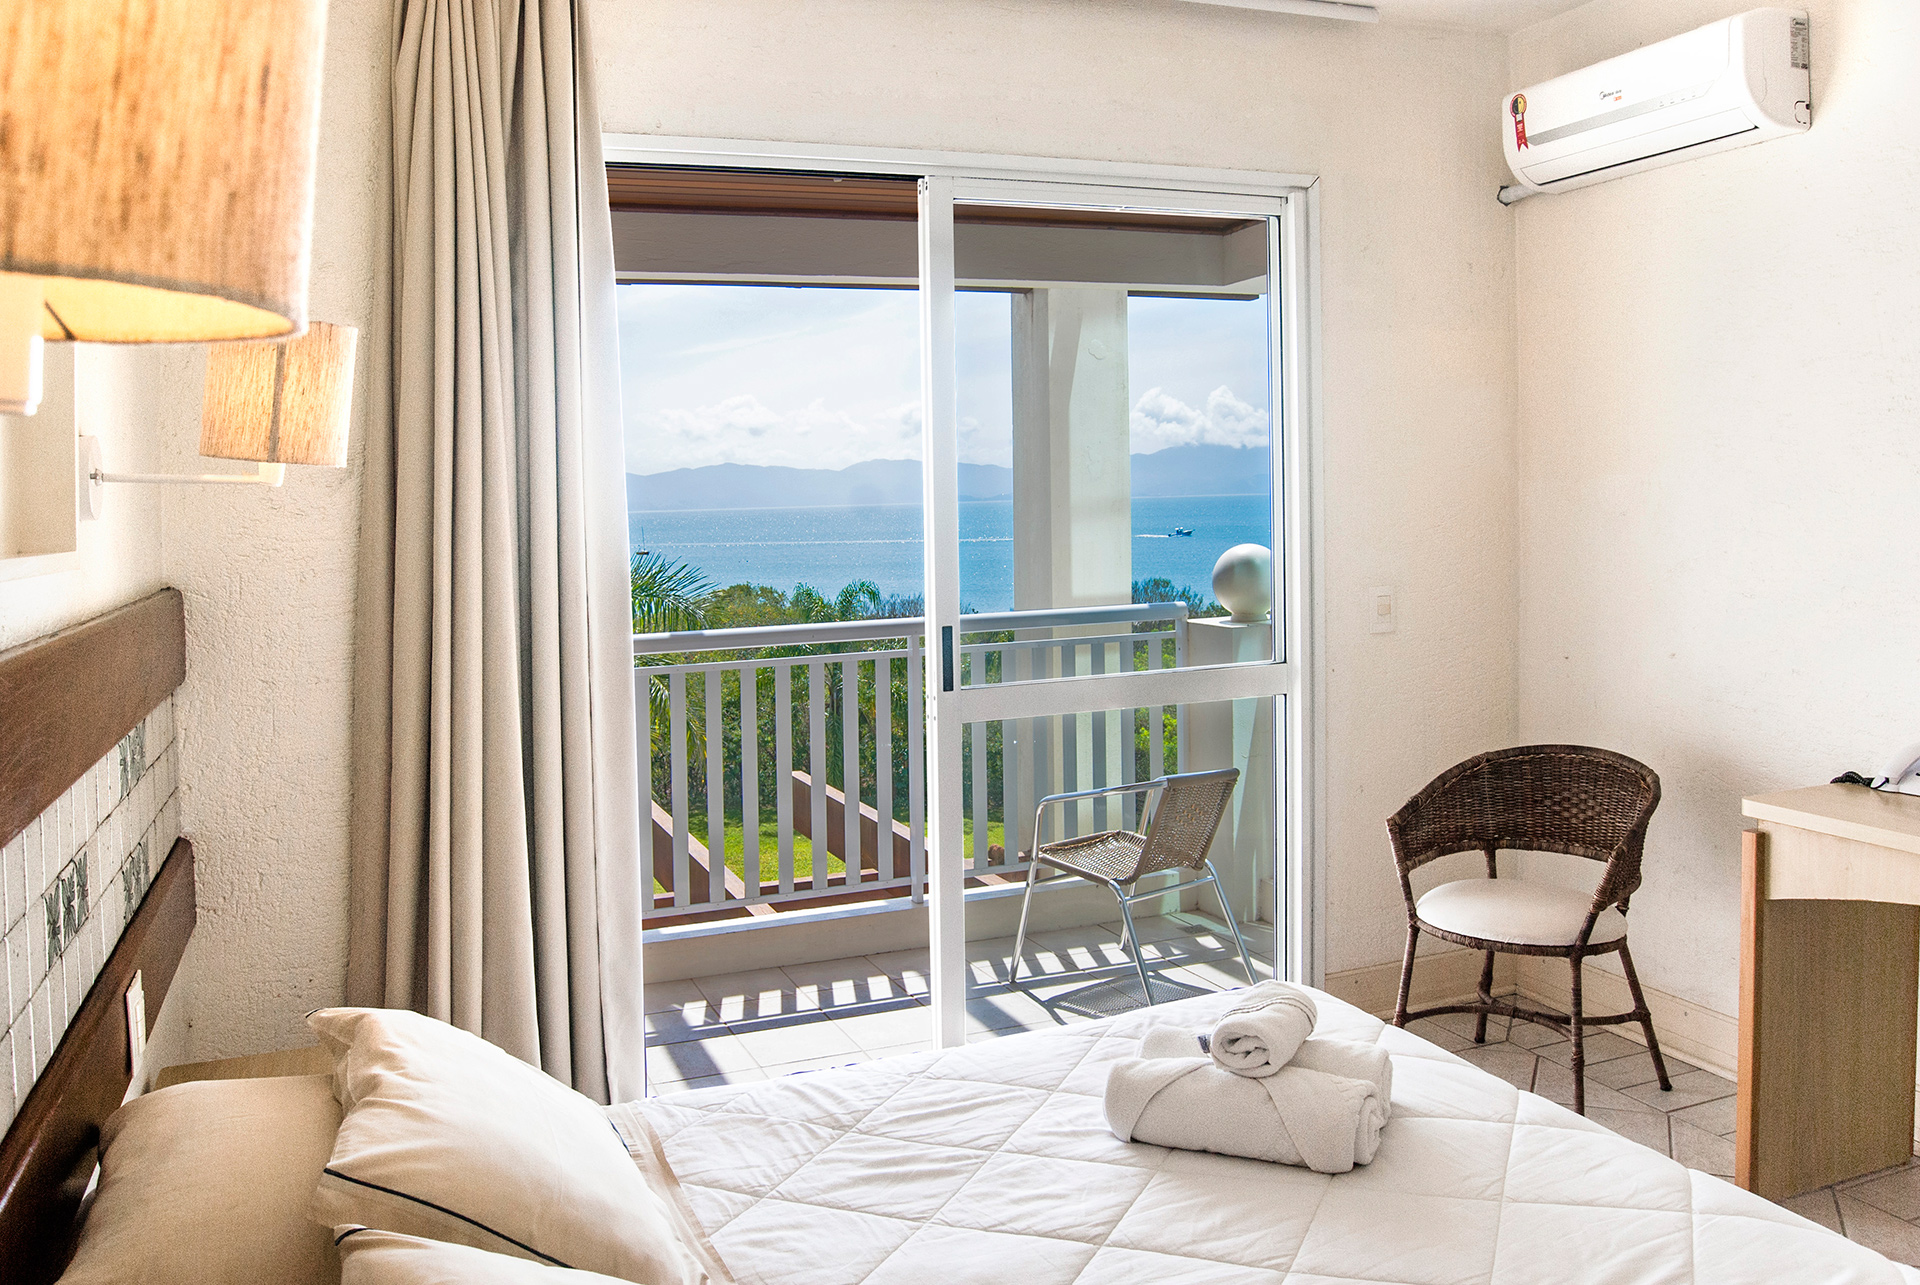 Hotel-Torres-da-Cachoeira-Florianopolis-por-Bruno-Sampaio-frente-mar-1.jpg